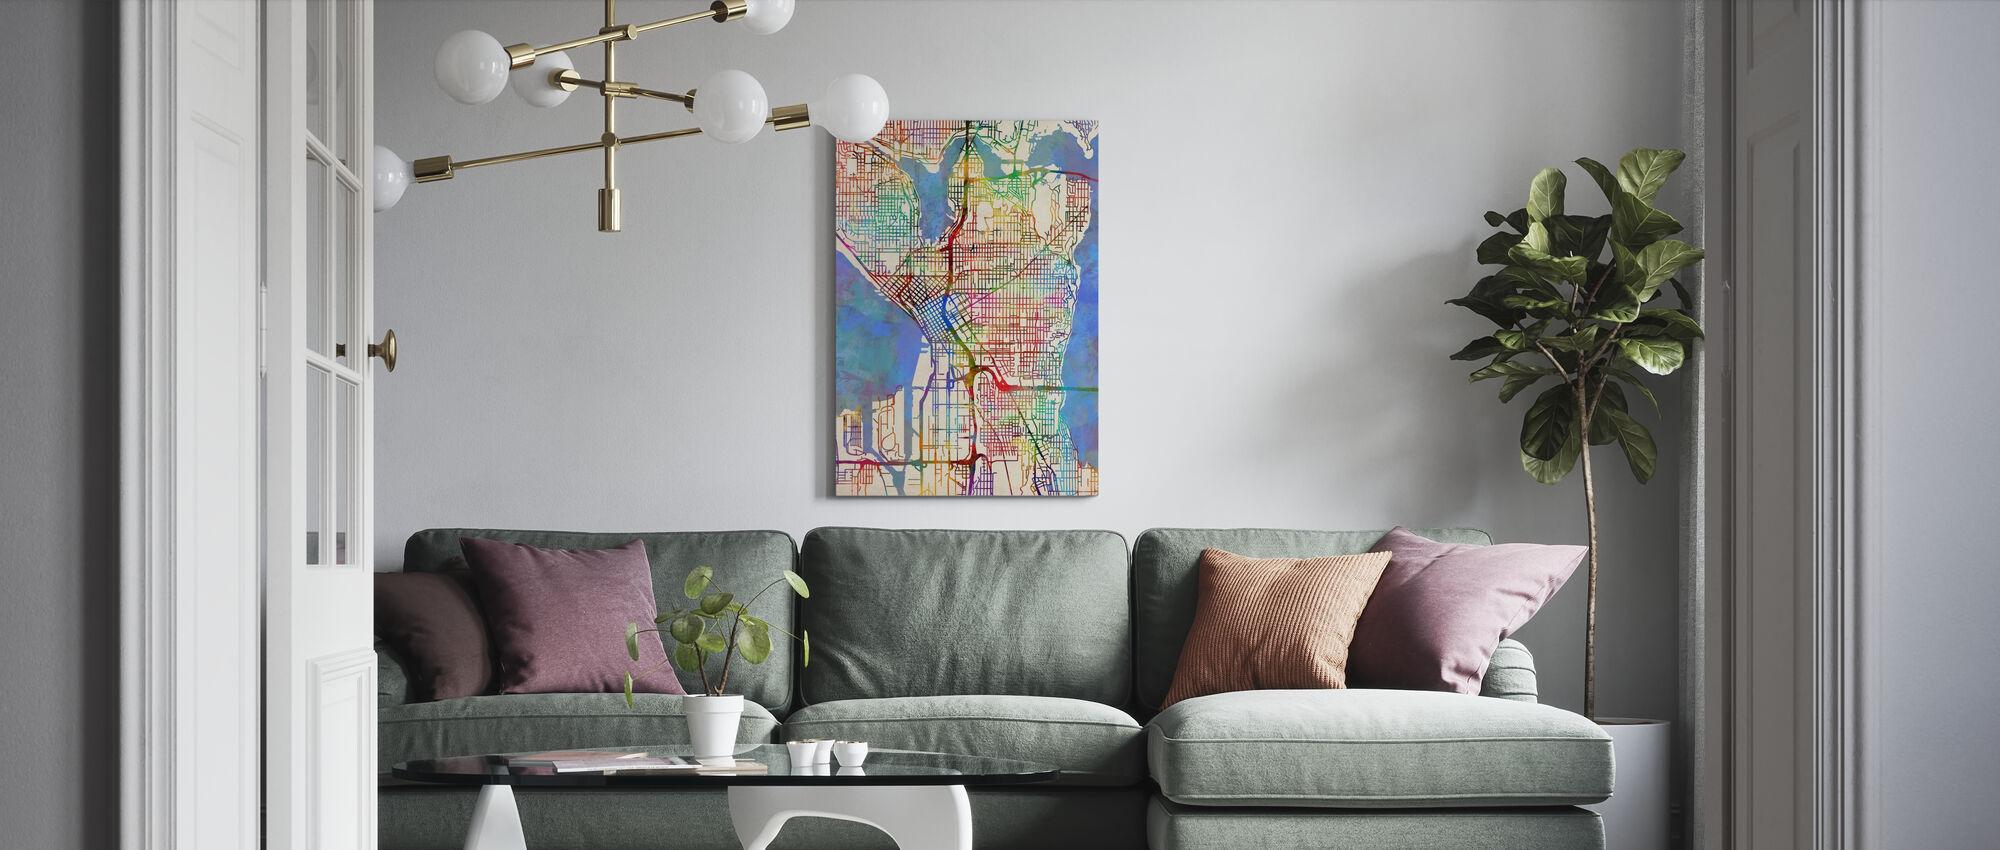 Seattle Washington Street Karta - Canvastavla - Vardagsrum